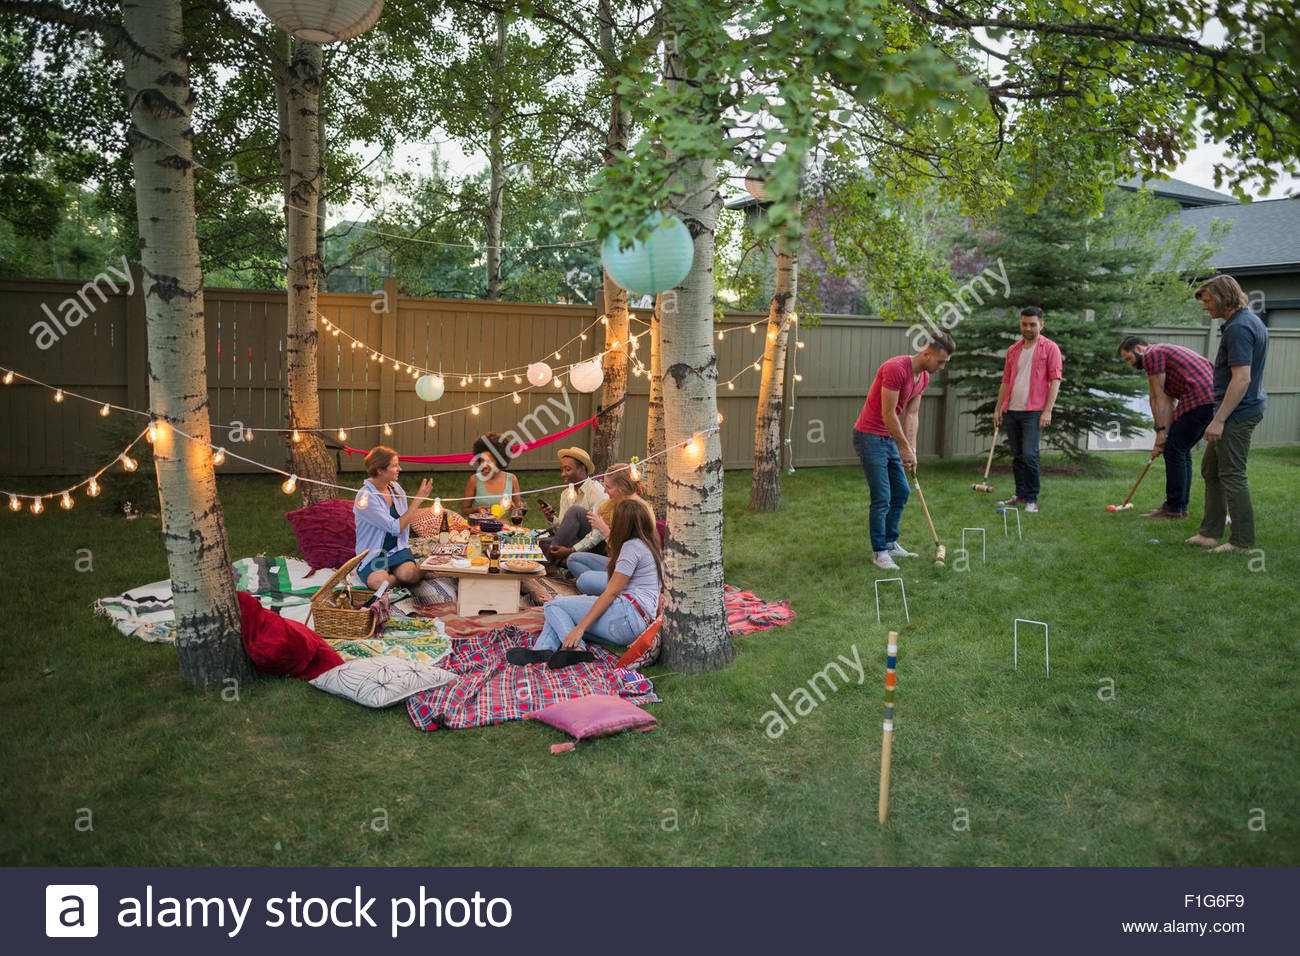 Backyard Party Stock Photos & Backyard Party Stock Images - Alamy on